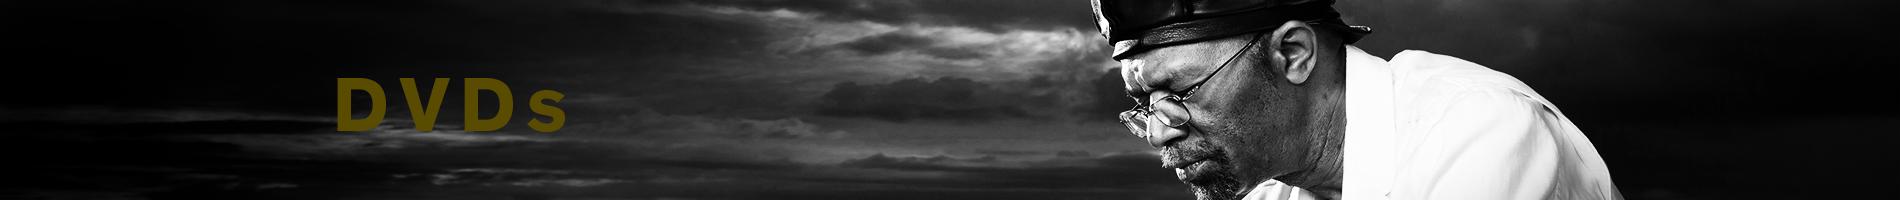 beres-banner-vp-reggaedvds-1900x200.png